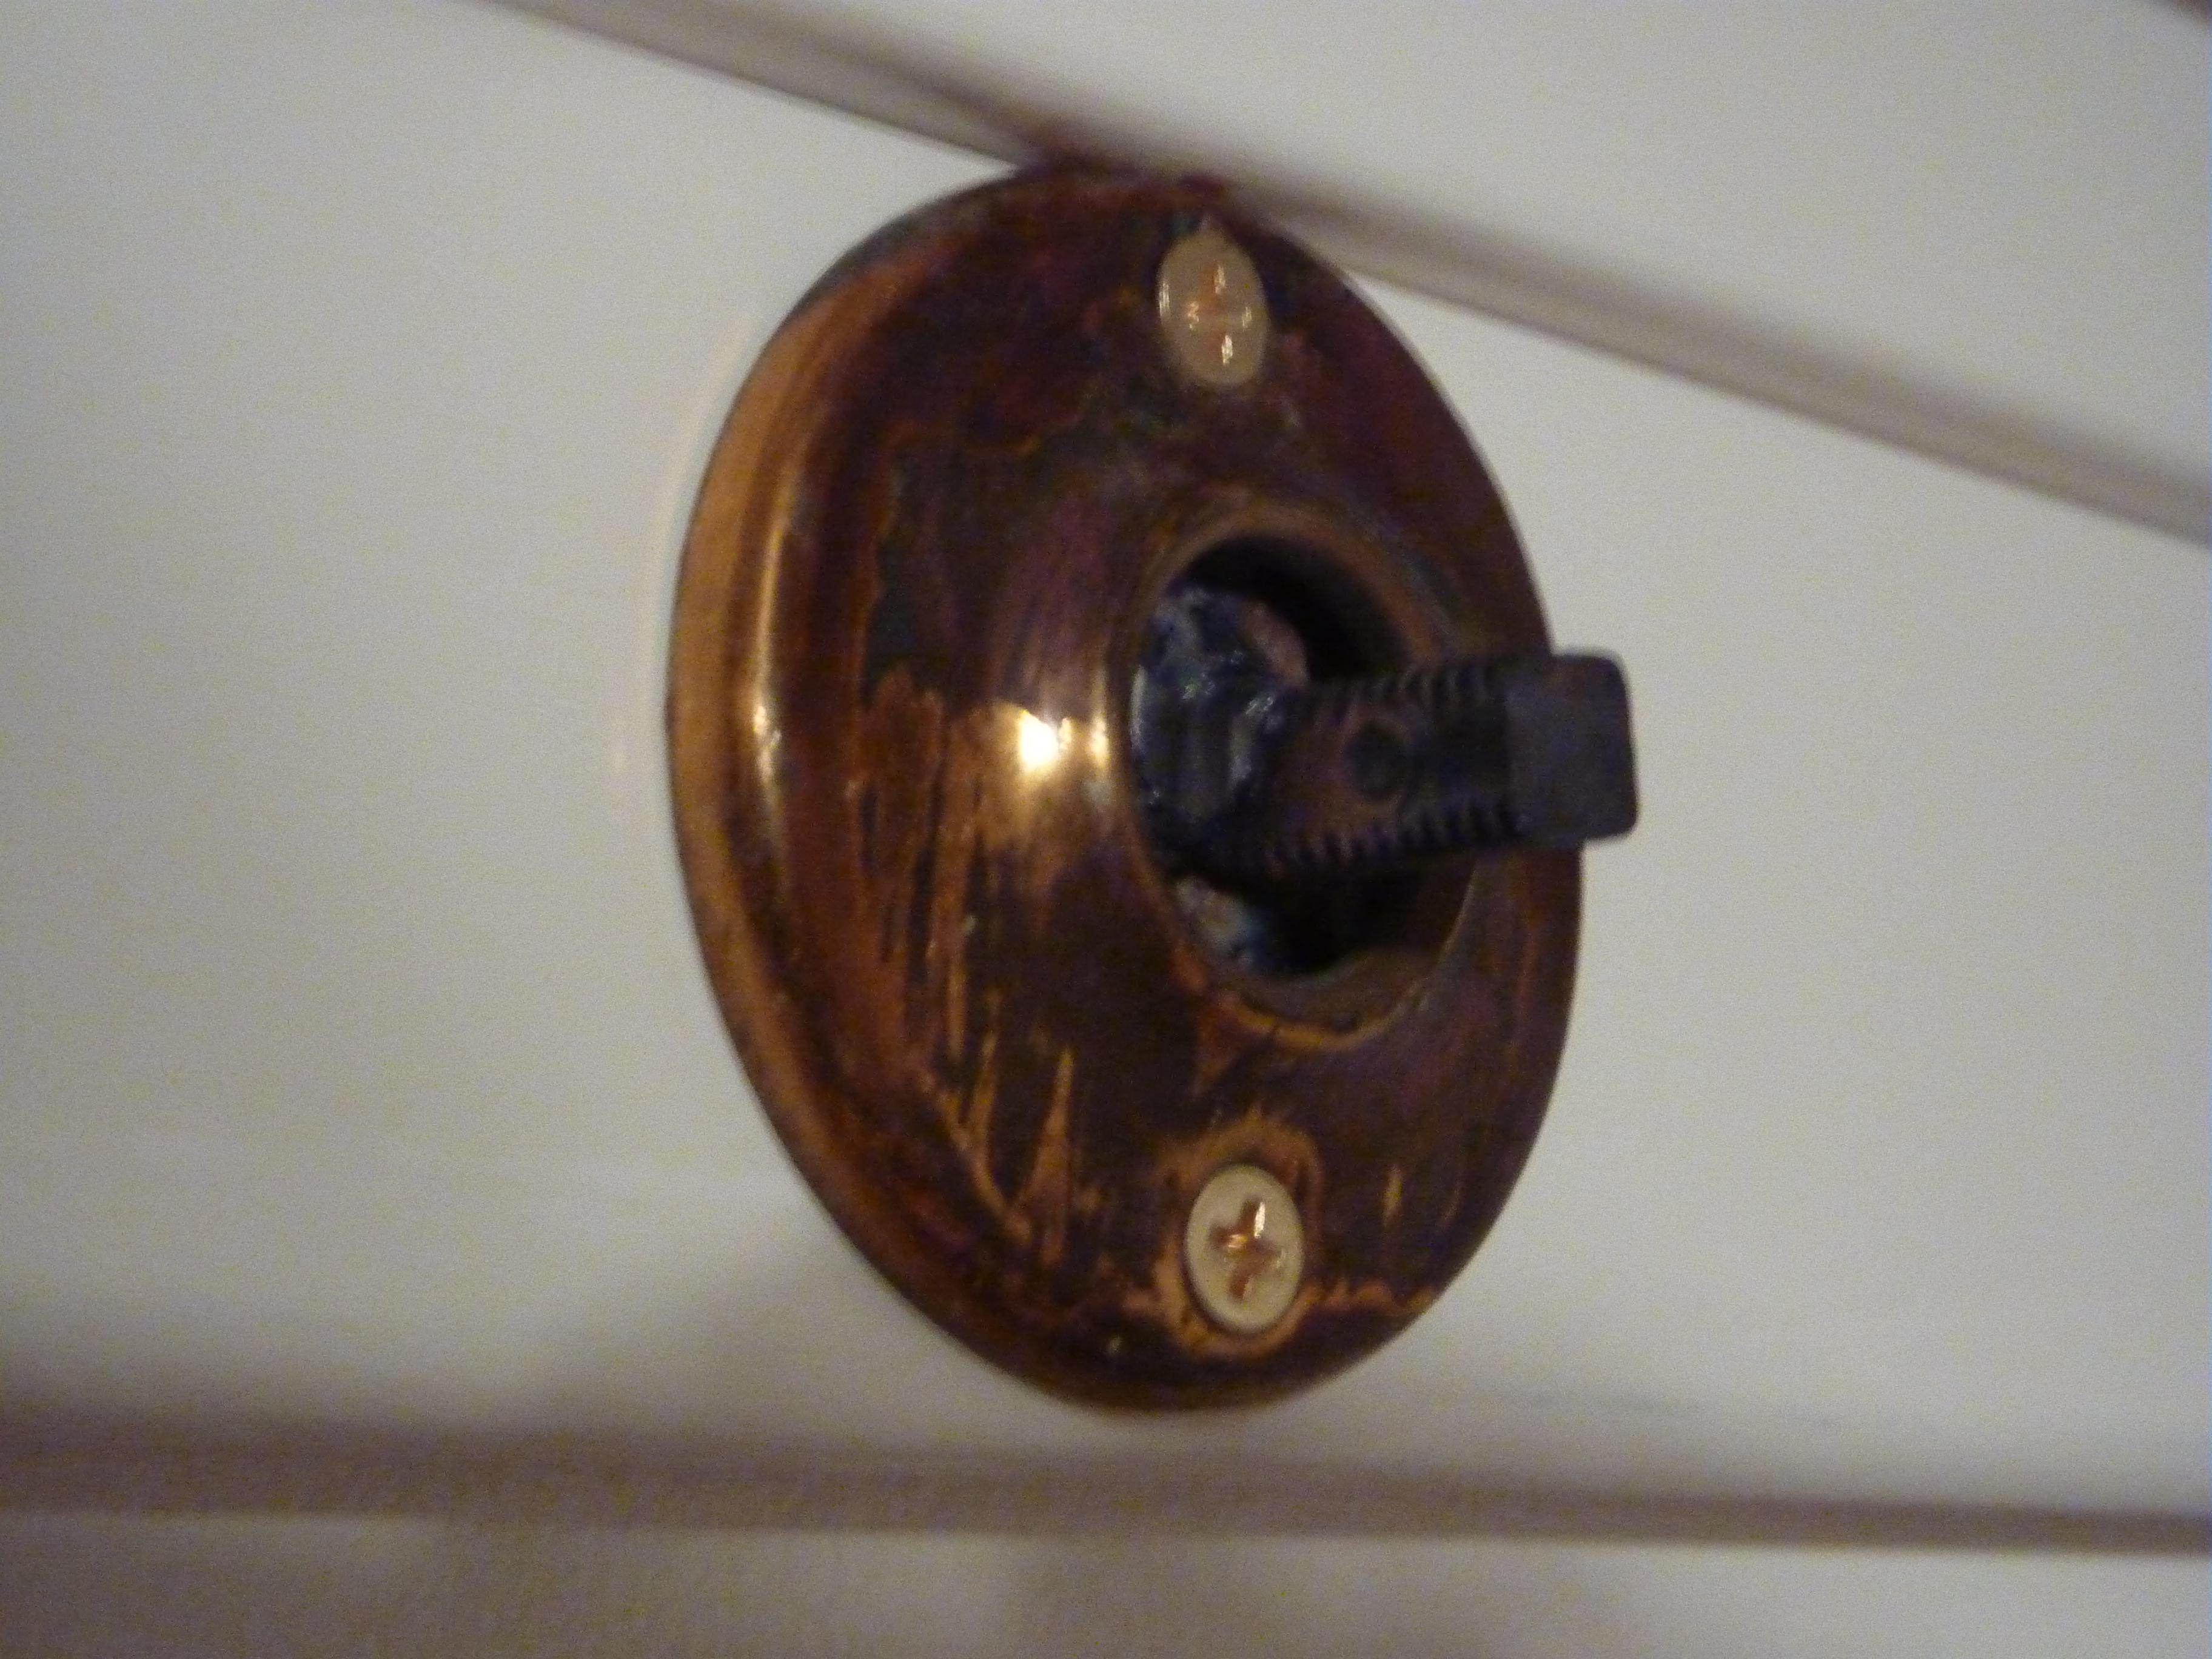 how to screw a doorknob hook into board and batten